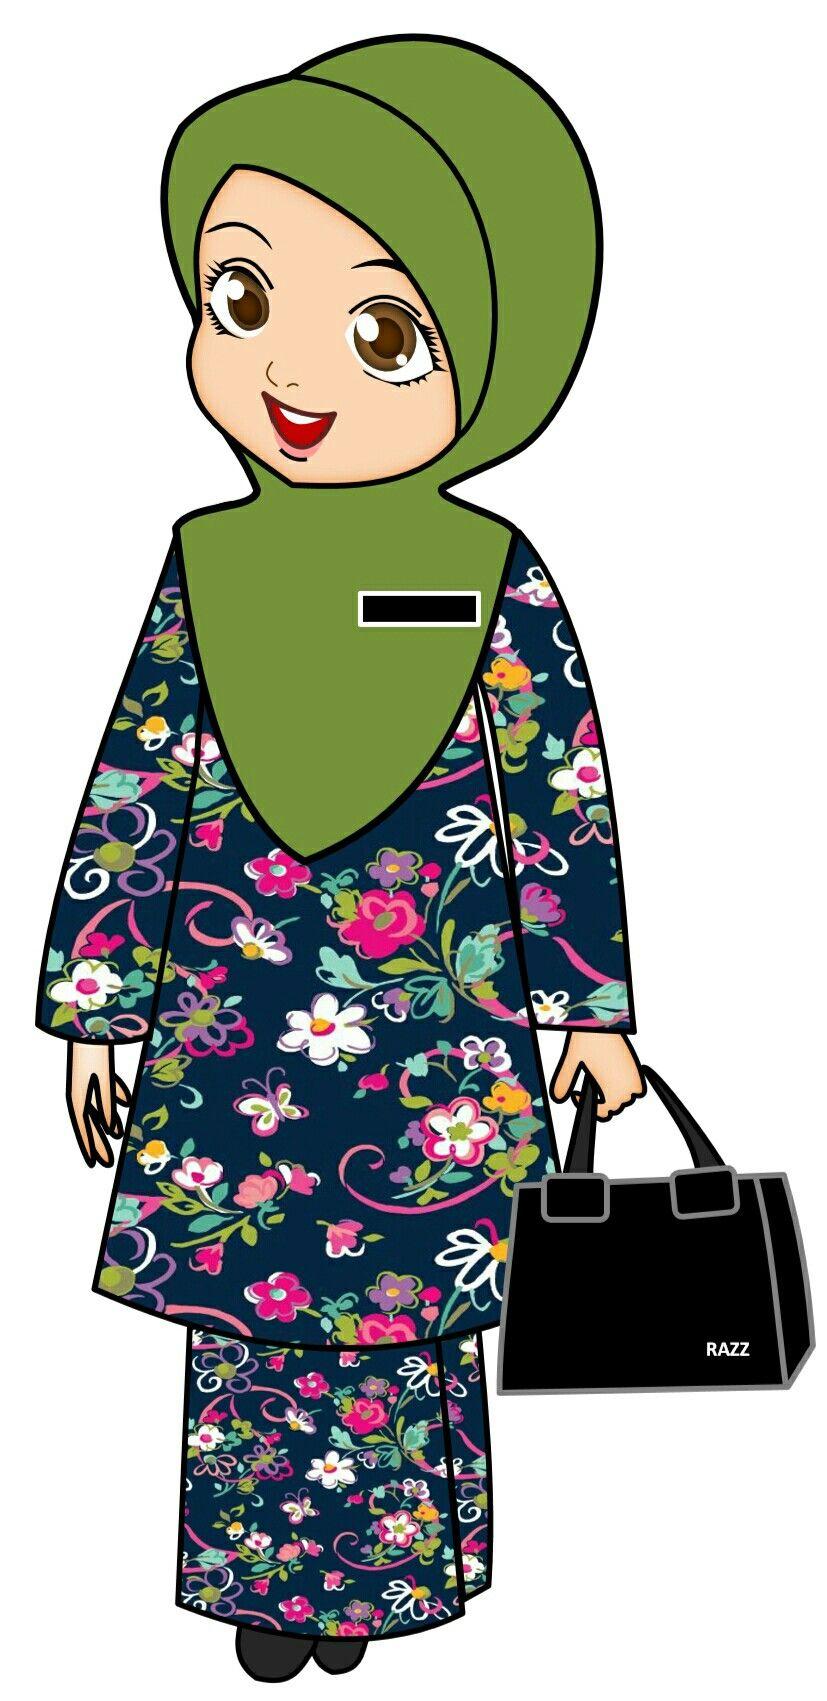 Pin oleh Qami Gifts di doodle sekolah Kartun, Anak, Animasi